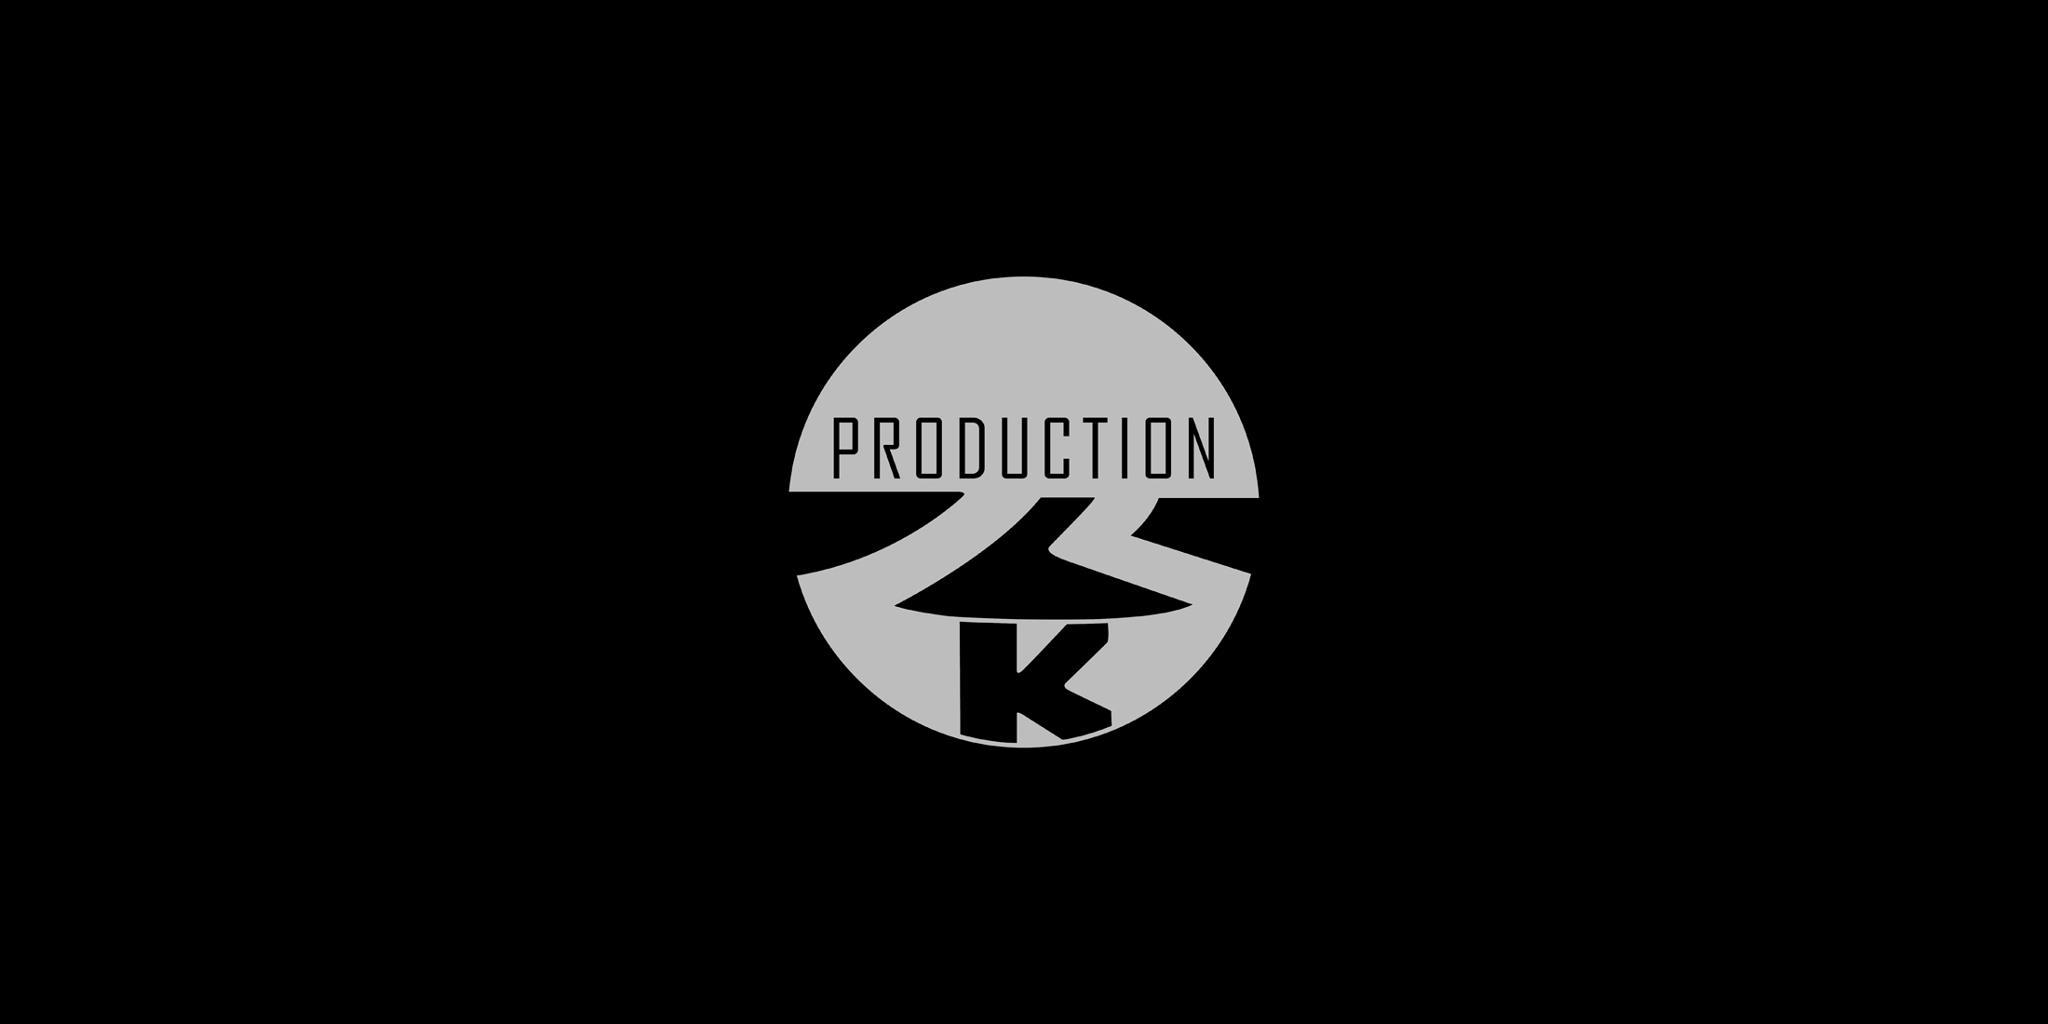 23k Production